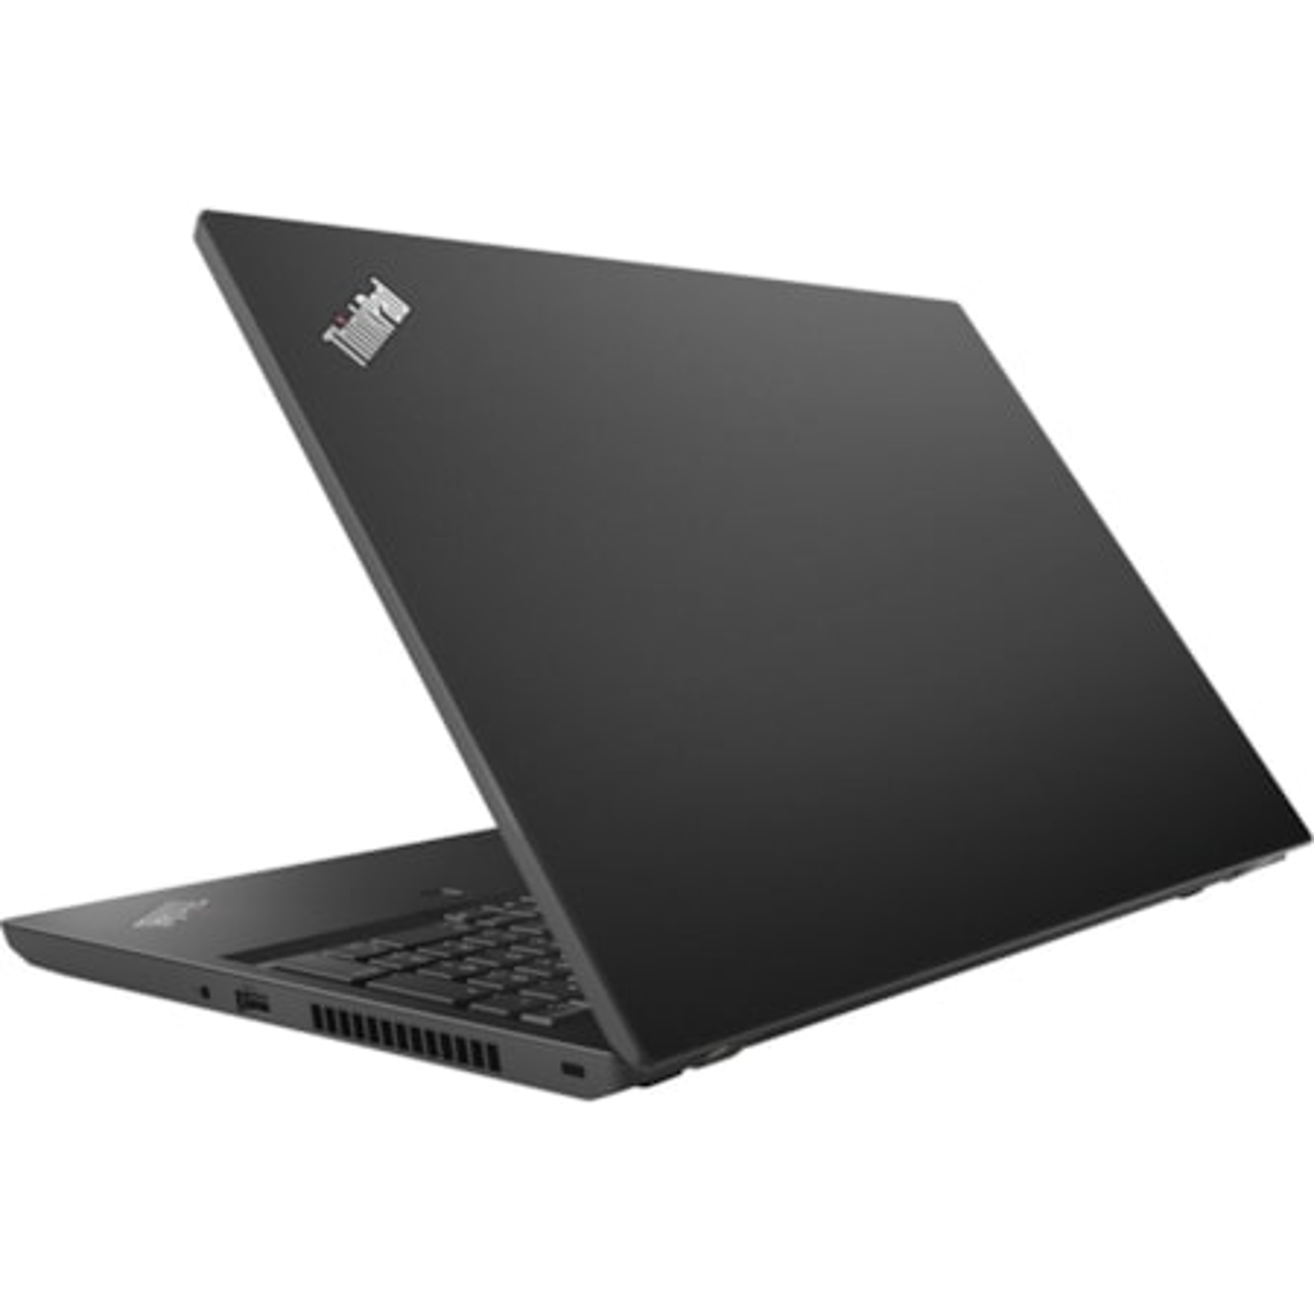 "Lenovo ThinkPad L580 20LW000BAU 39.6 cm (15.6"") LCD Notebook - Intel Core i5 (8th Gen) i5-8250U Quad-core (4 Core) 1.60 GHz - 8 GB DDR4 SDRAM - 256 GB SSD - Windows 10 Pro 64-bit - 1366 x 768 - Graphite Black"